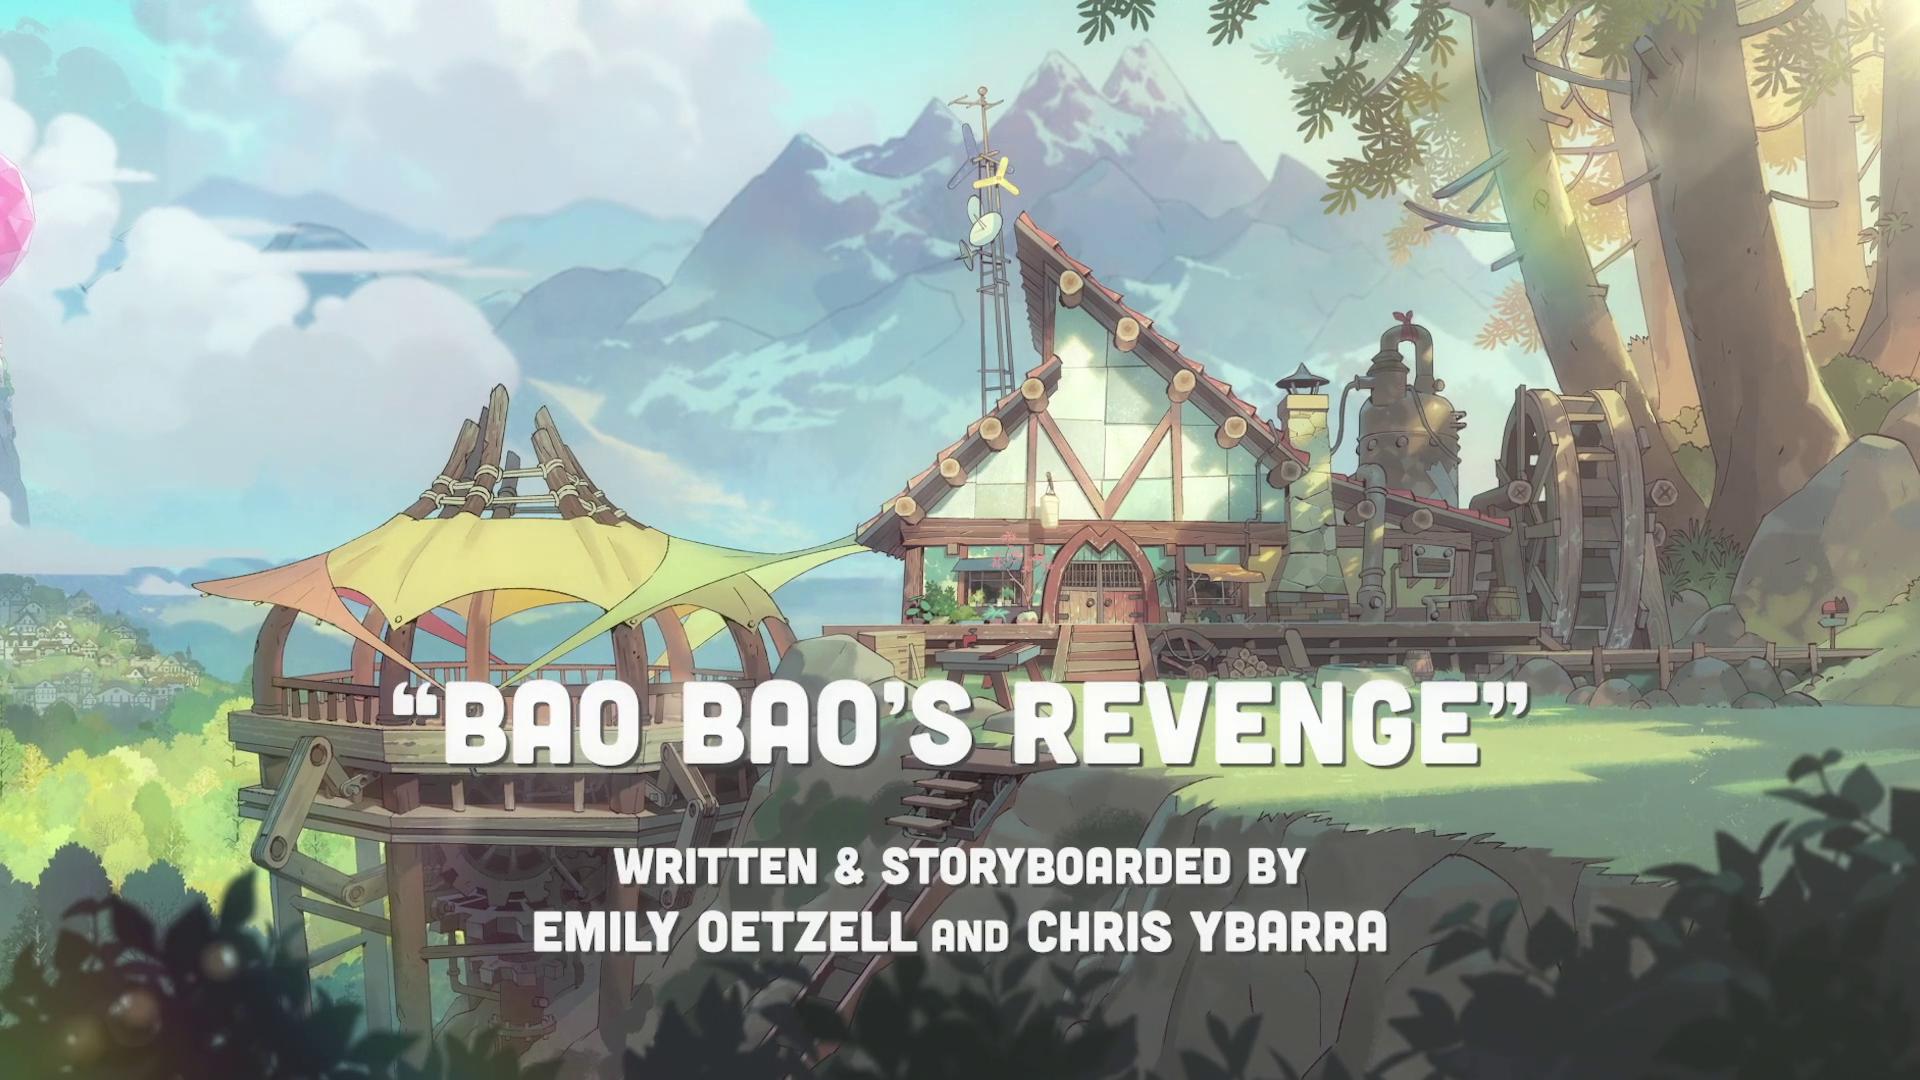 Bao Bao's Revenge